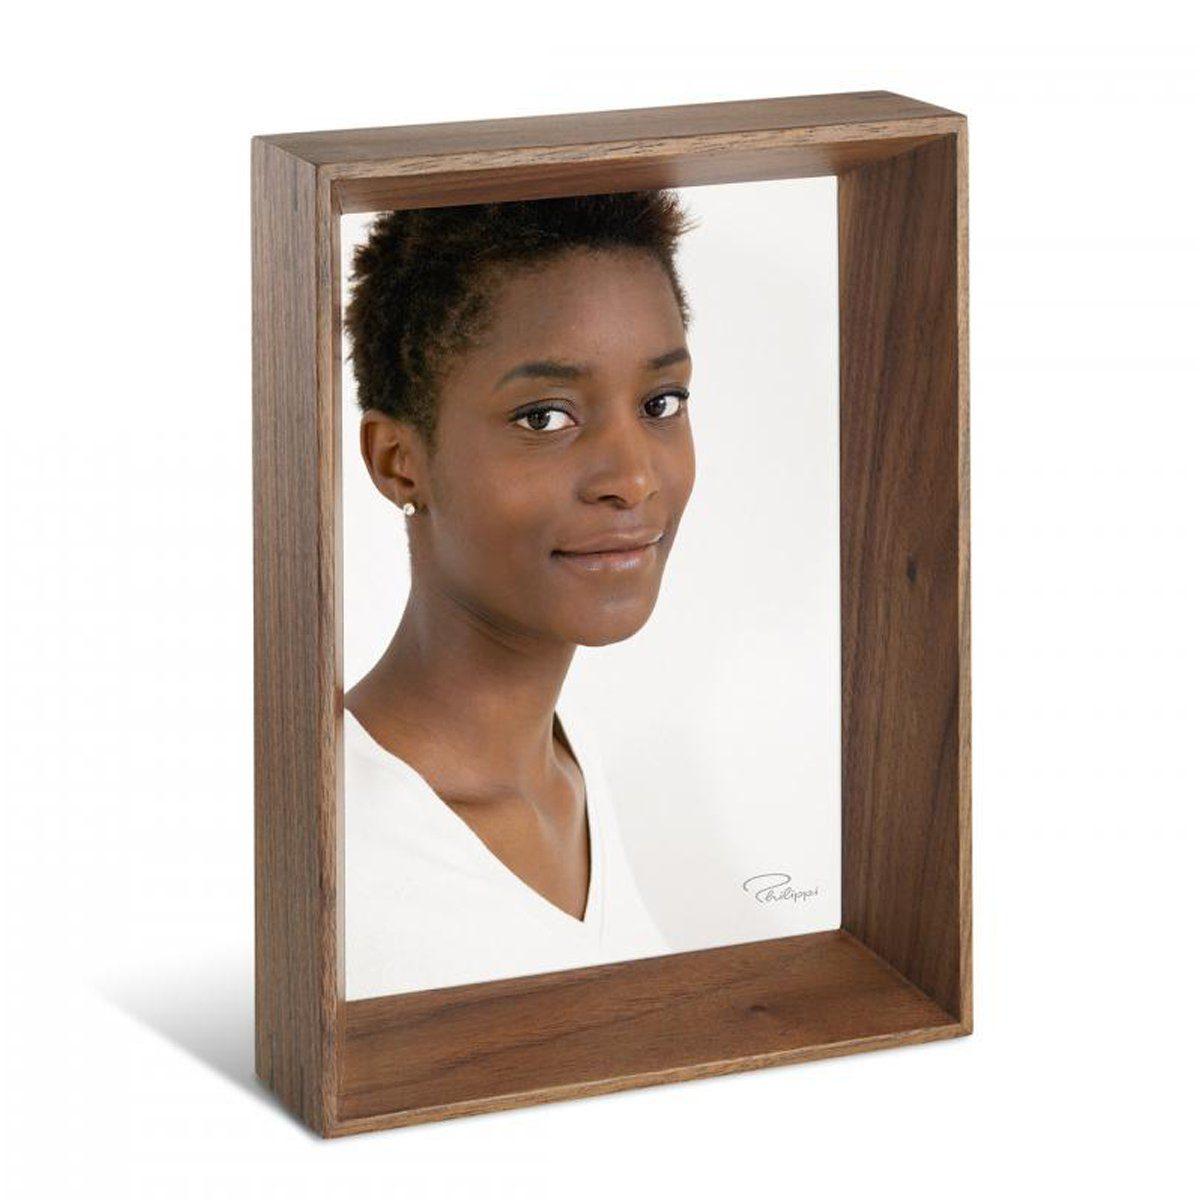 Philippi Philippi Bilderrahmen JOY, 10x15 cm